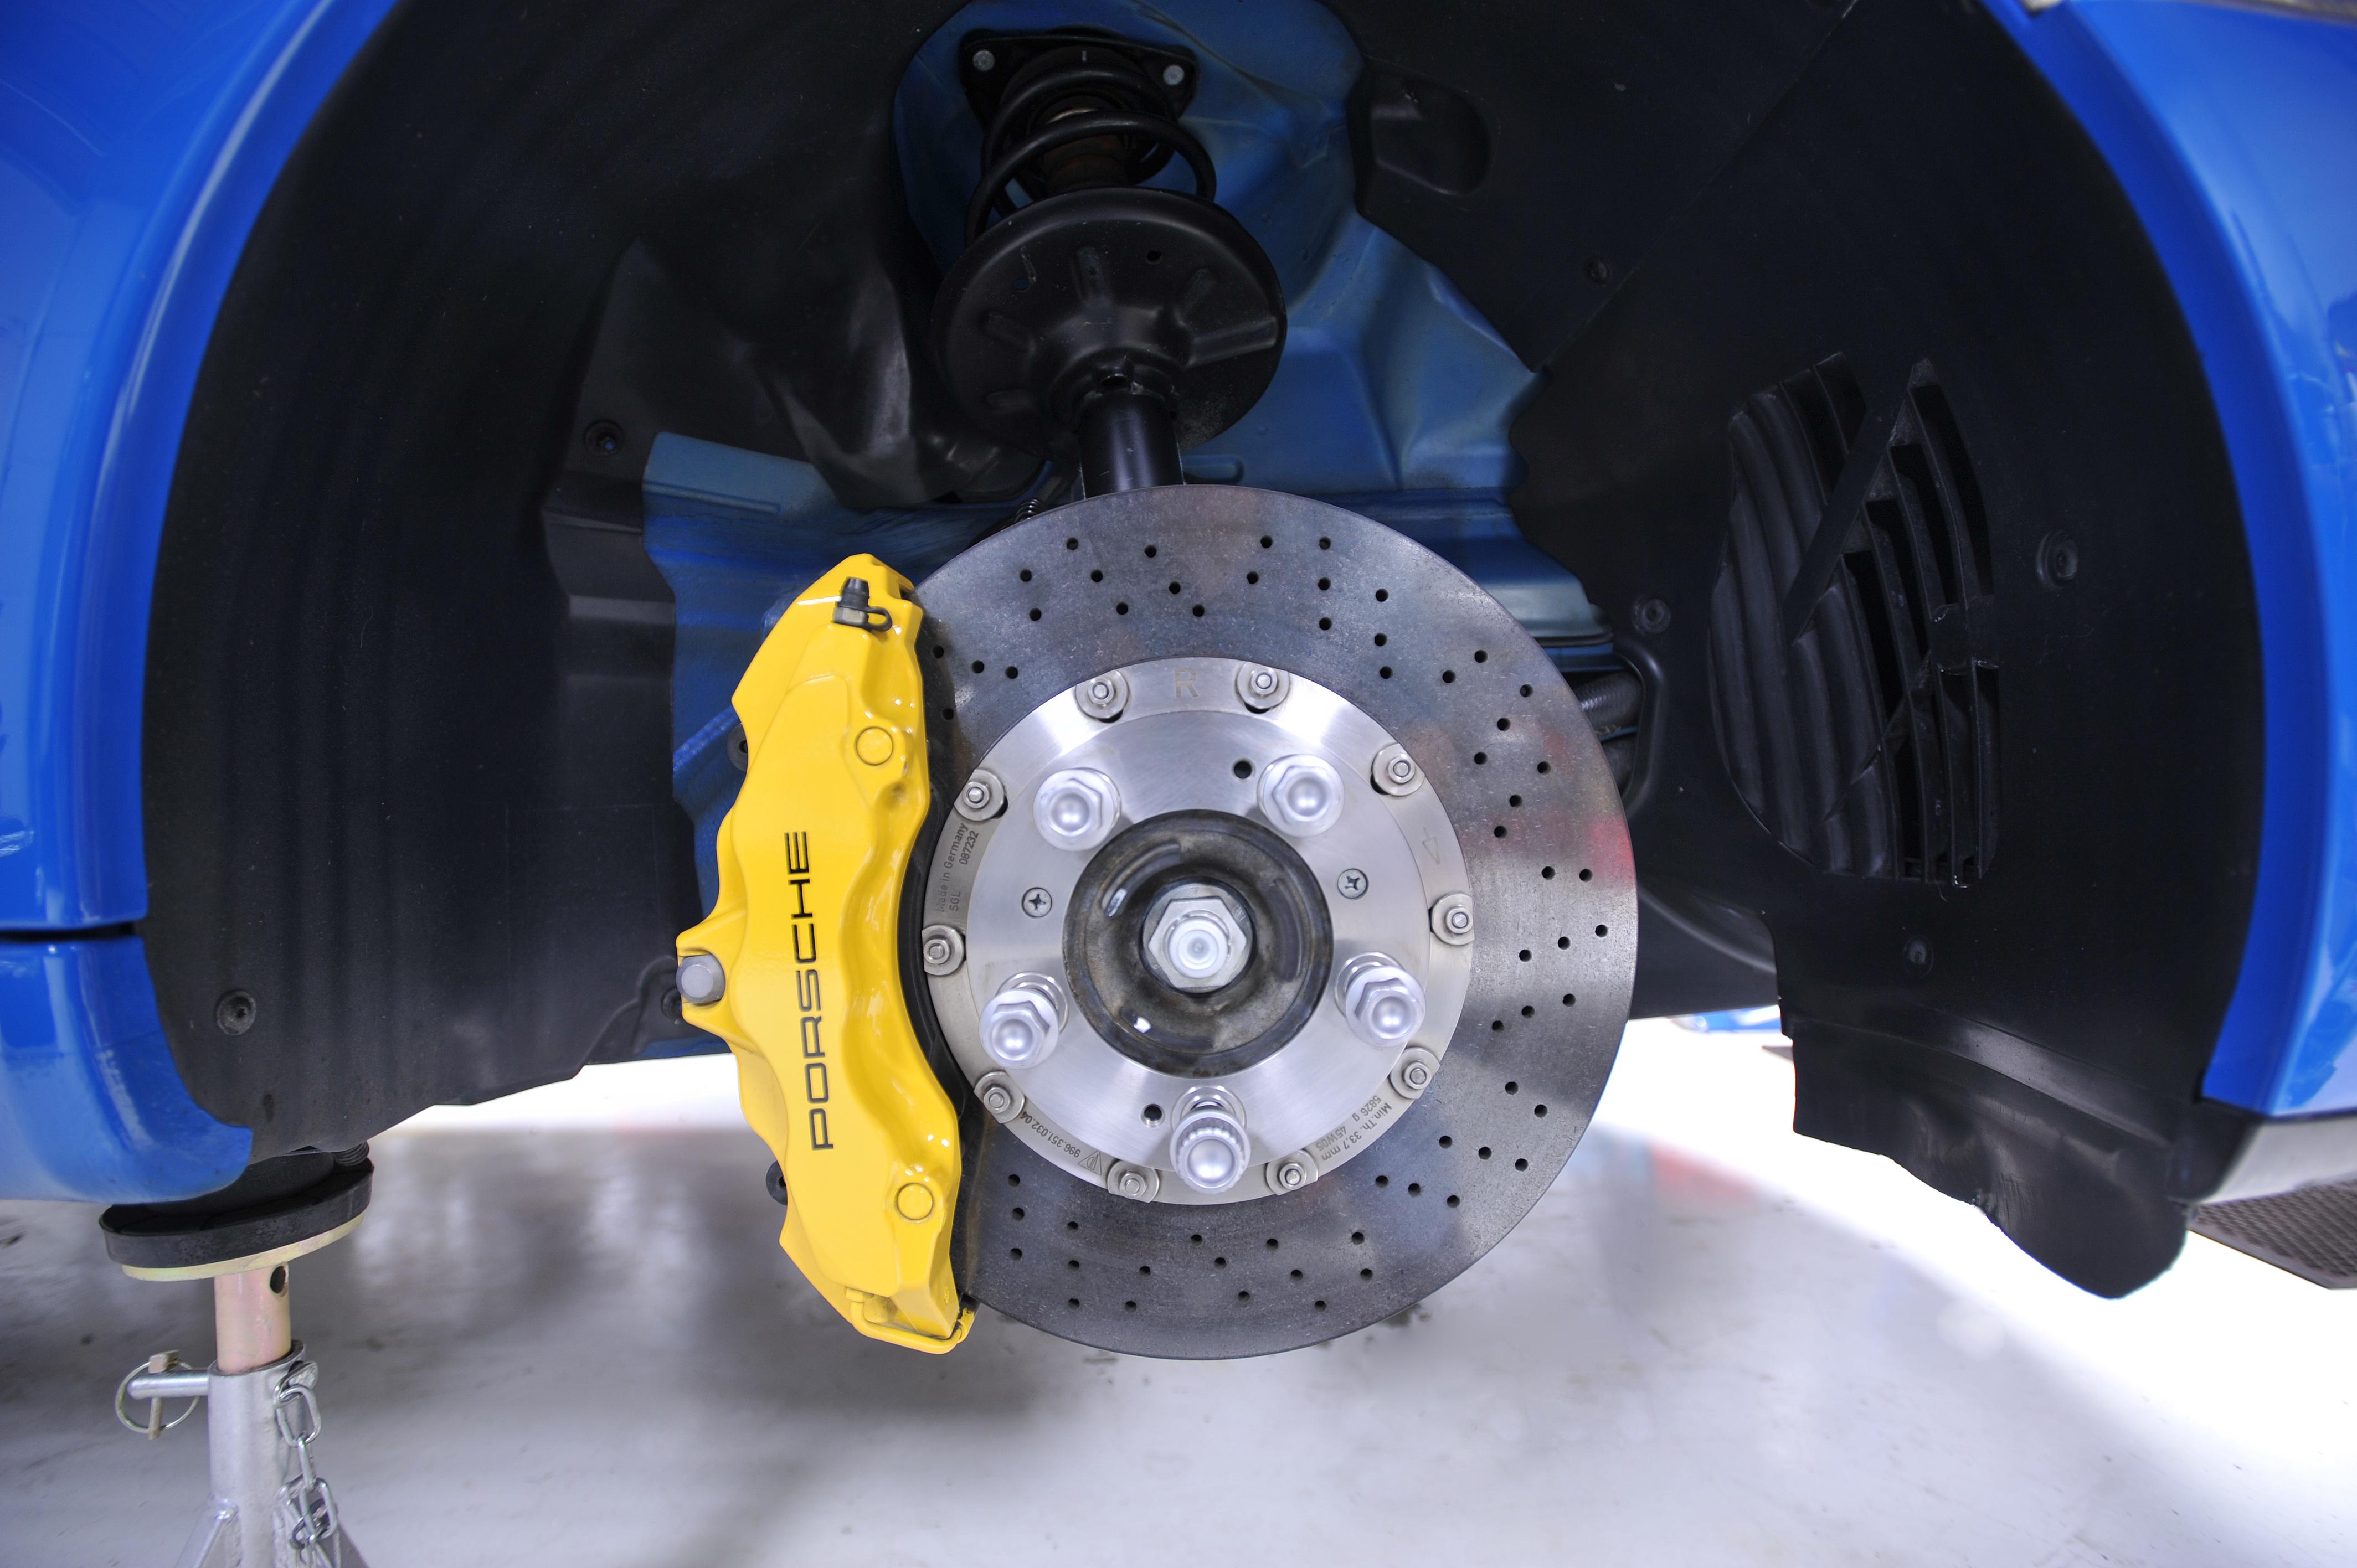 Brake failure indicator for automobiles